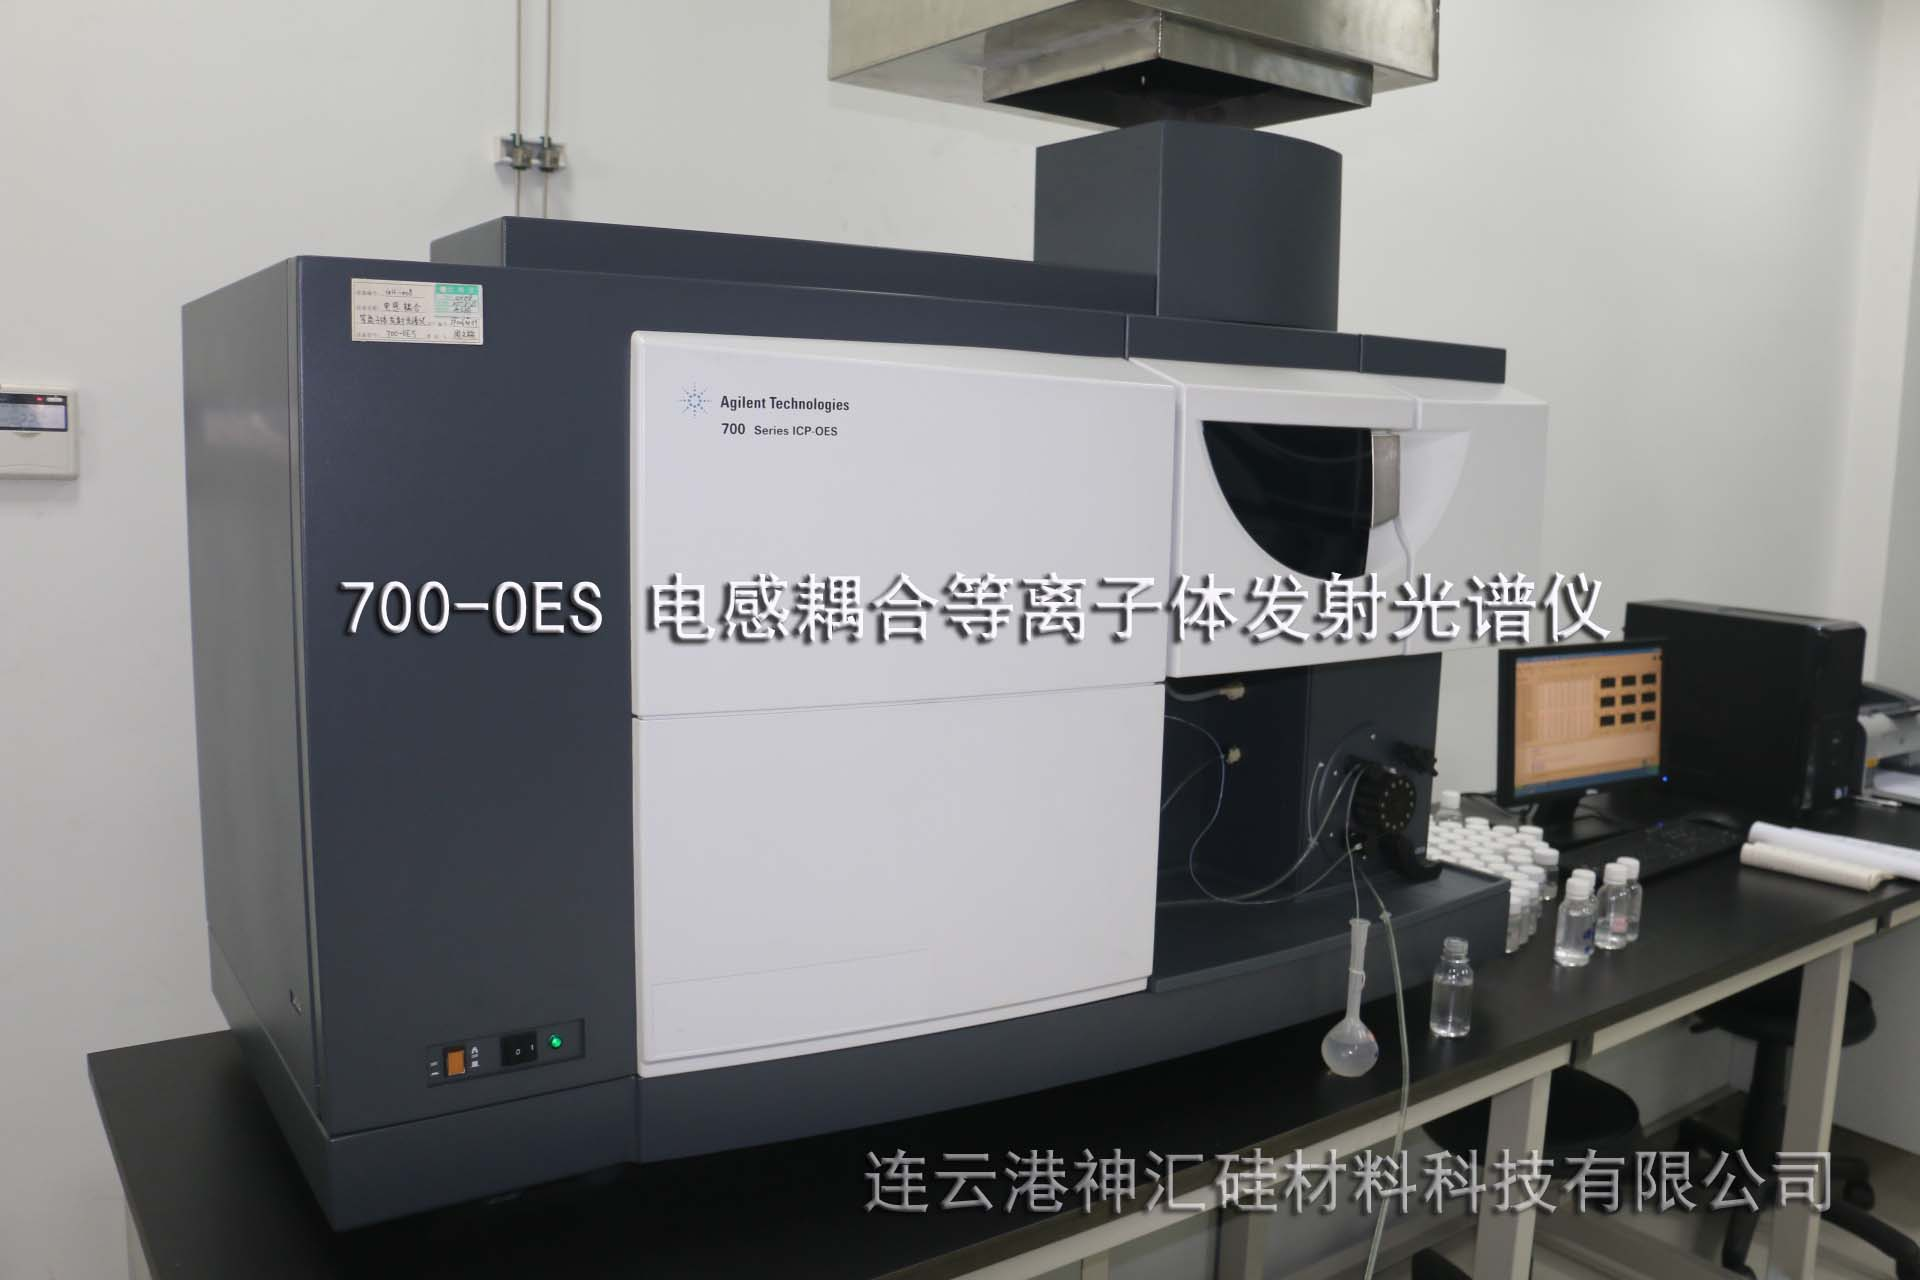 700-OES by inductively coupled plasma emission spectrometer